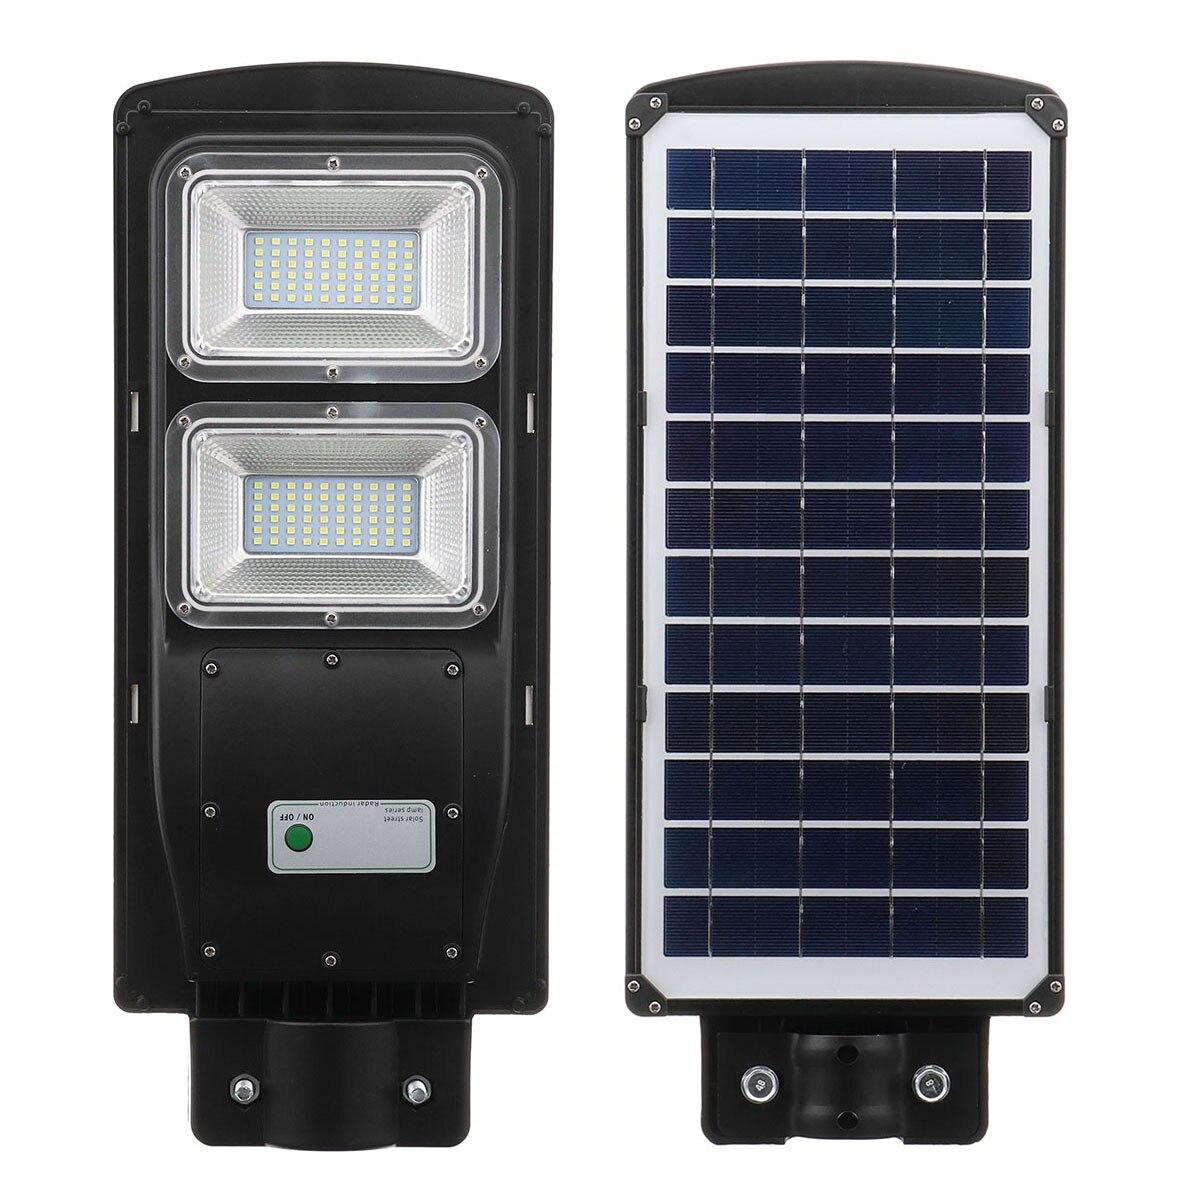 60W LED IP67 Solar Street Light Radar with PIR Motion Sensor Outdoor Lighting Wall Lamps Solar Landscape Garden Lights 1